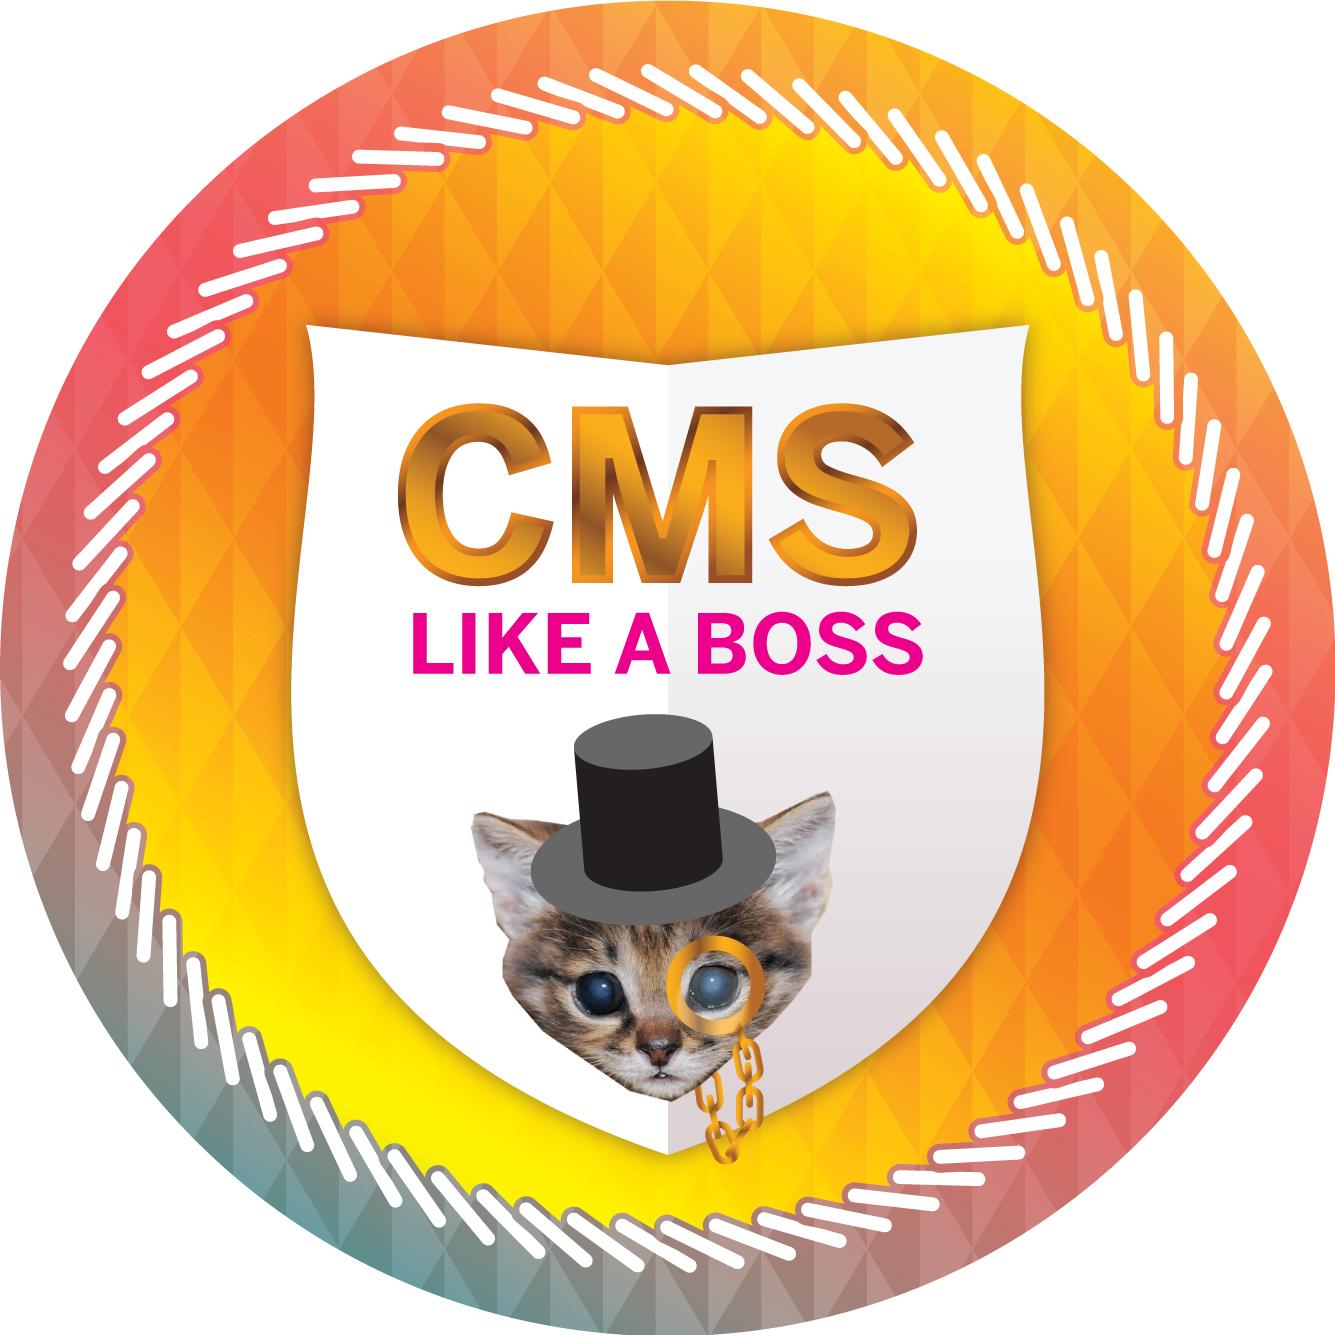 CMSBadge.jpg